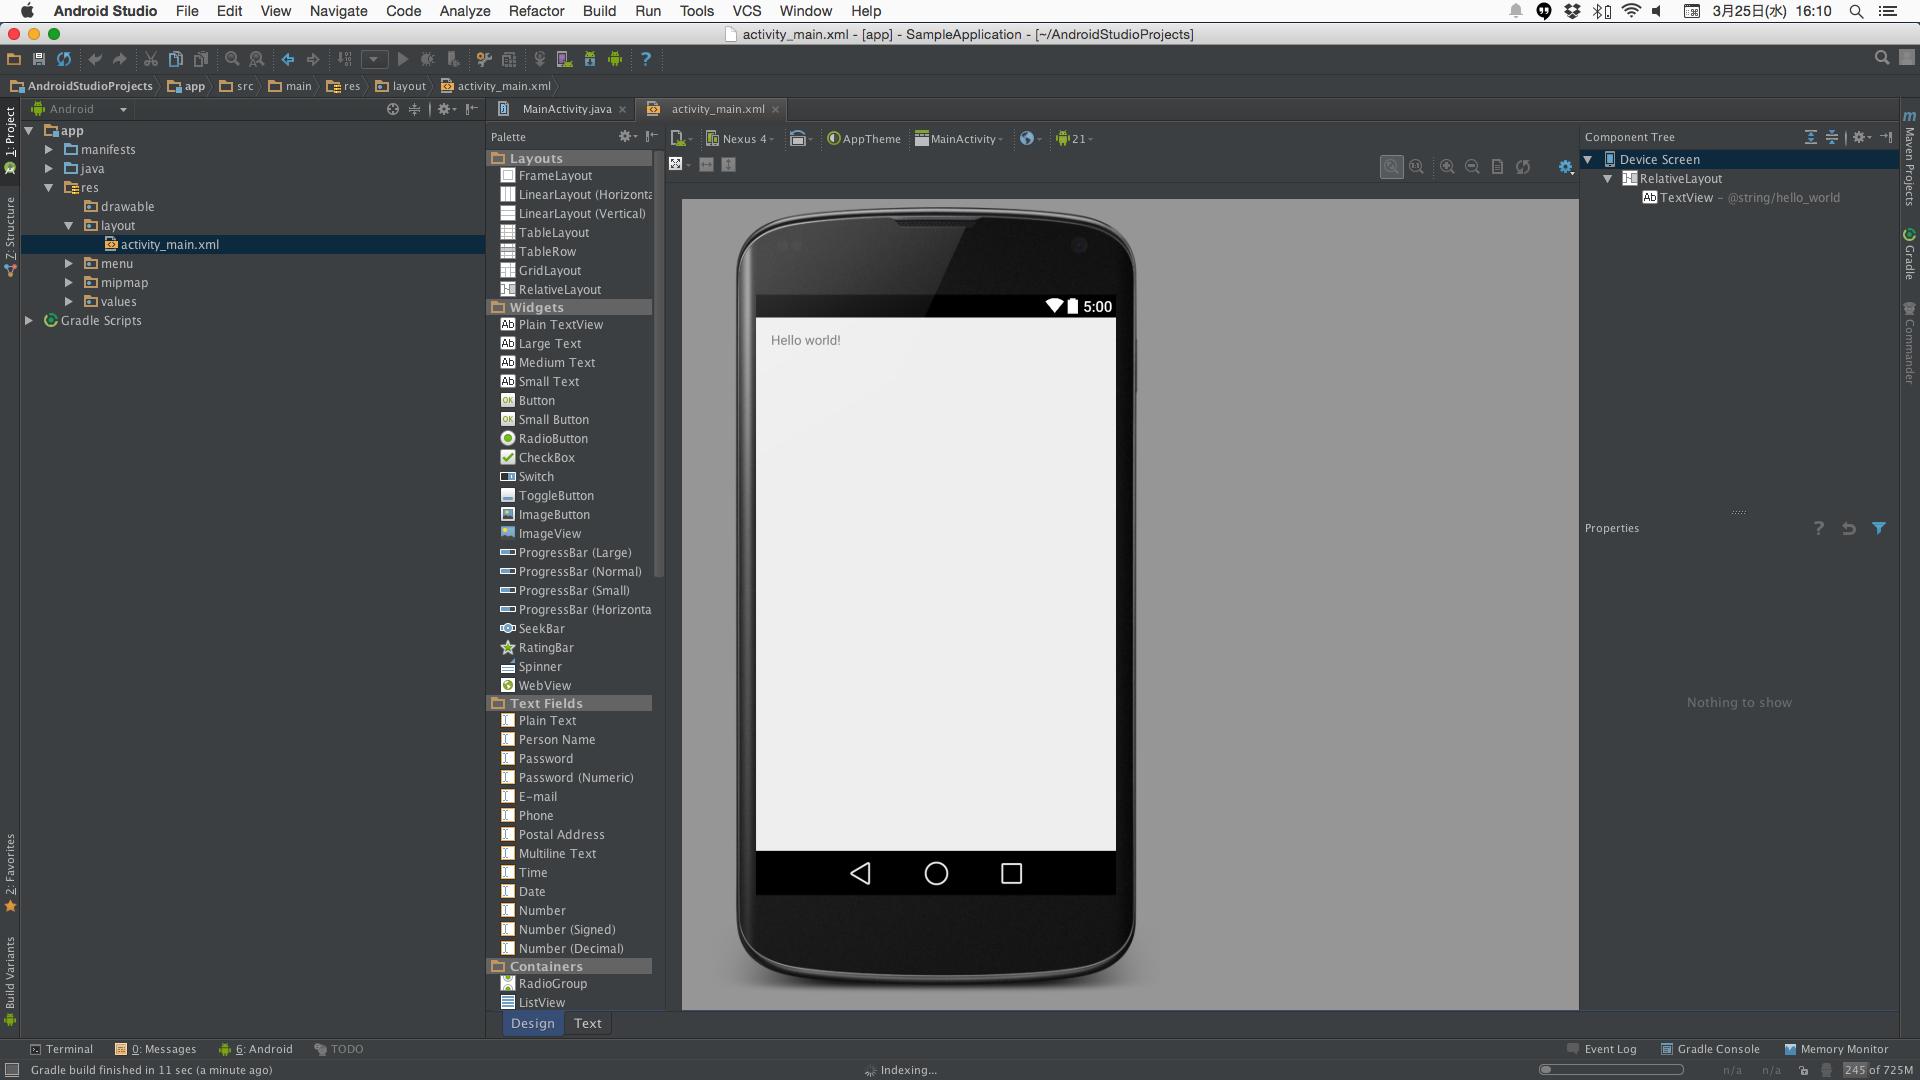 AndroidStudio10